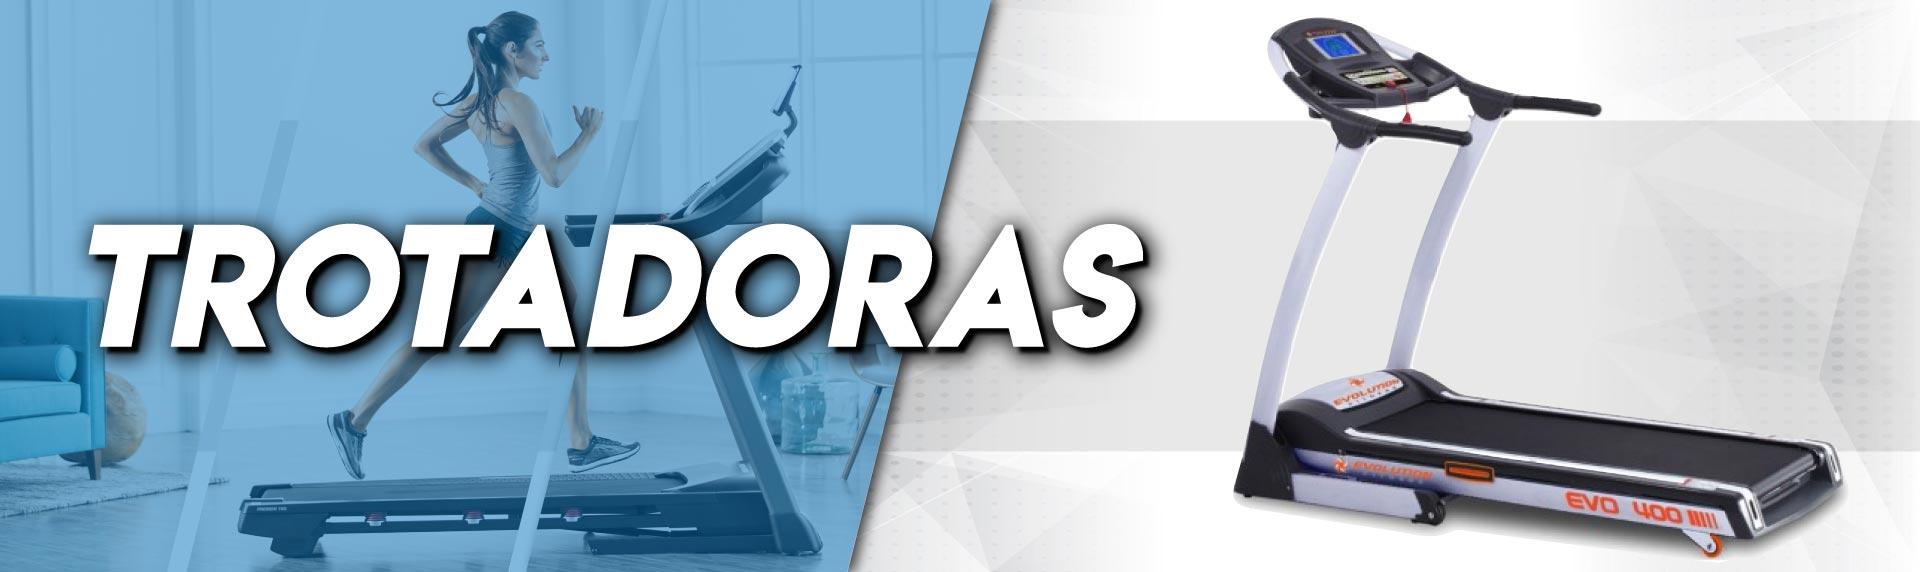 AK-KT-SUBCAT-DEPORTES-TROTADORAS-1